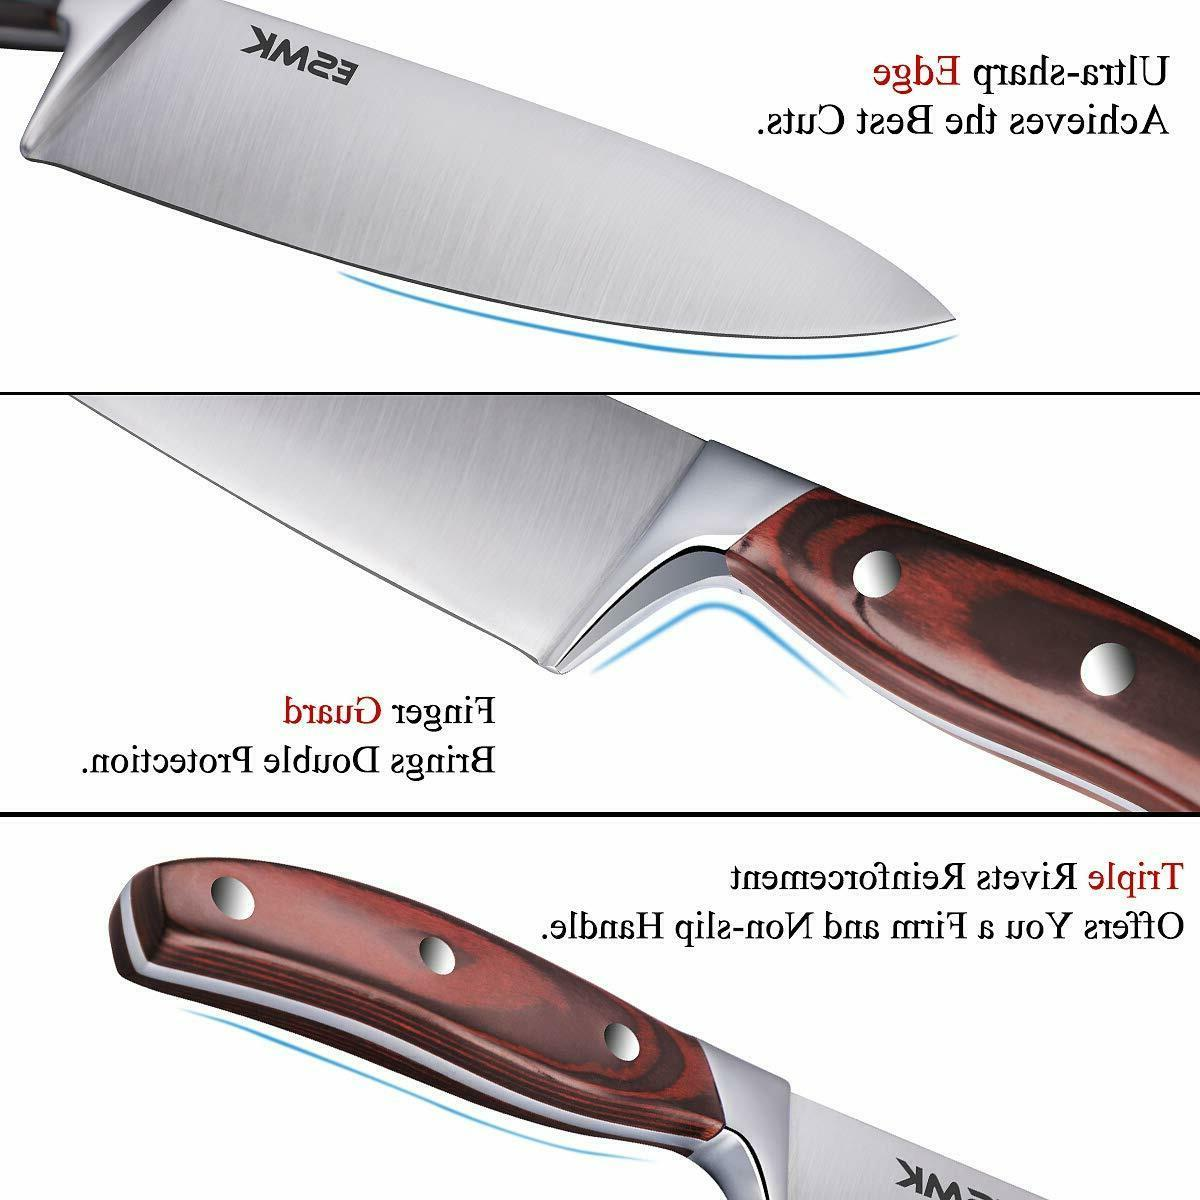 15-Pcs Steel Kitchen Knife Wooden Block Sharpener Ro